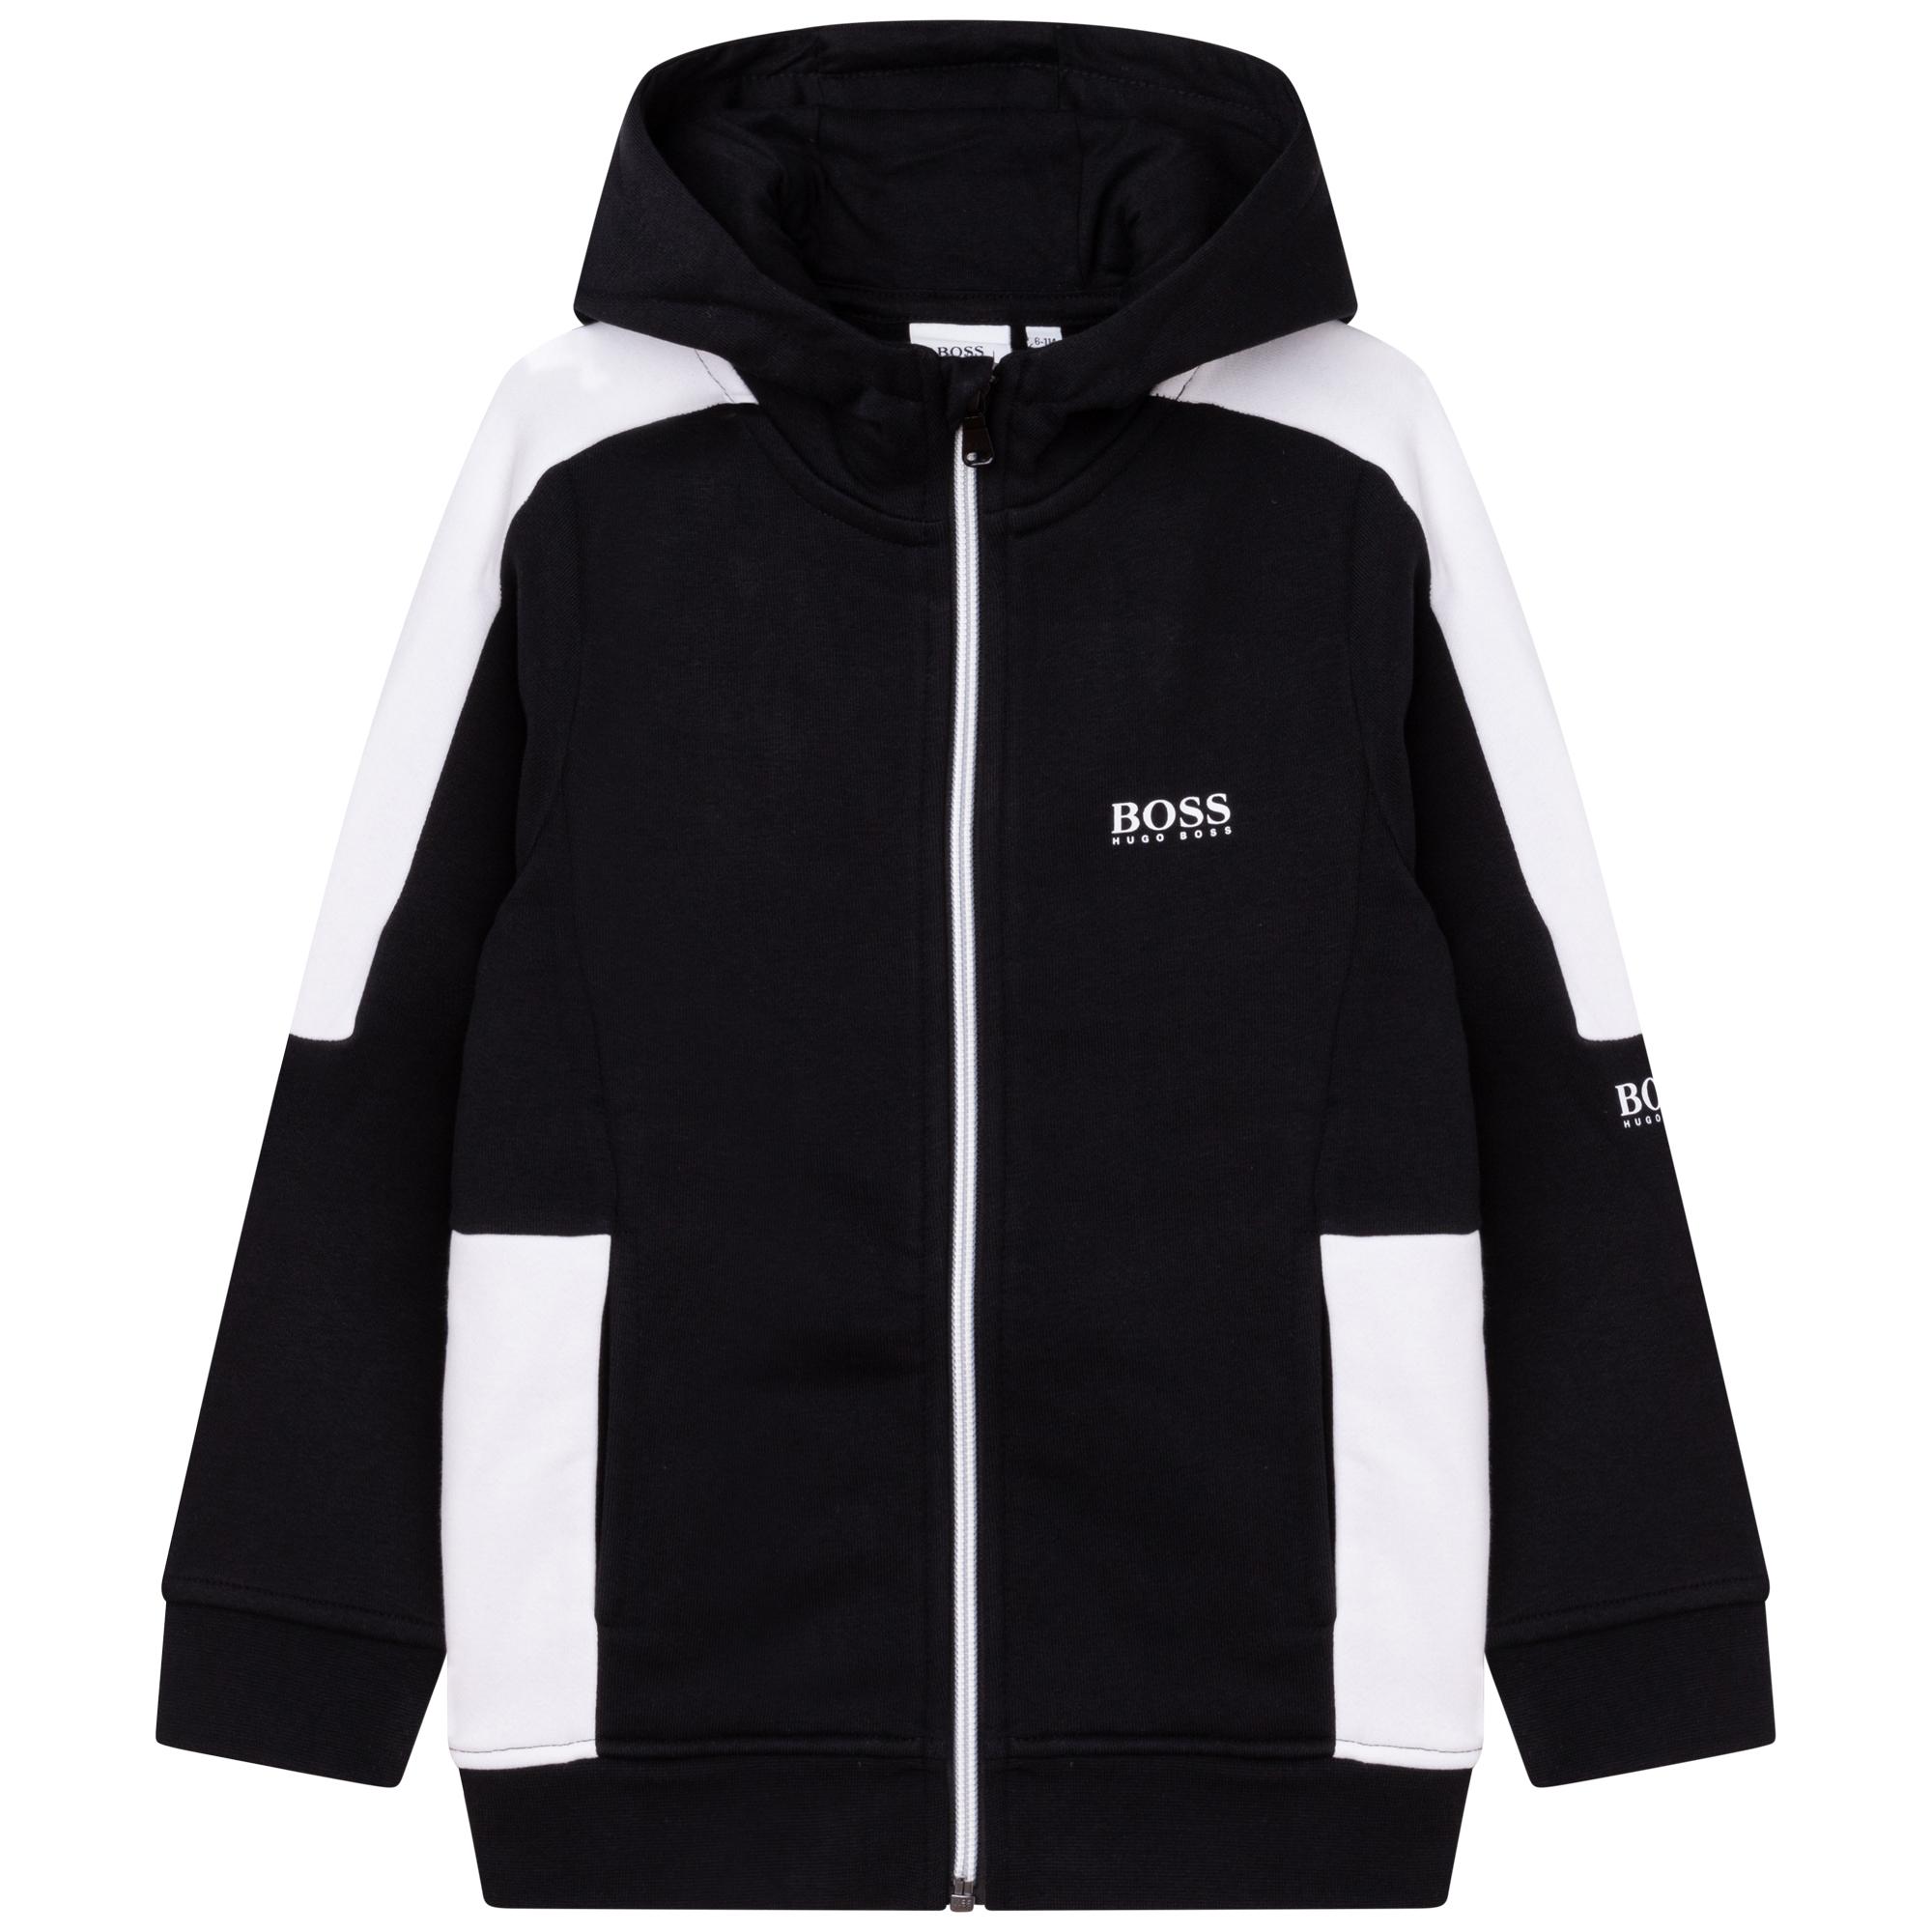 Zipped hooded cardigan BOSS for BOY